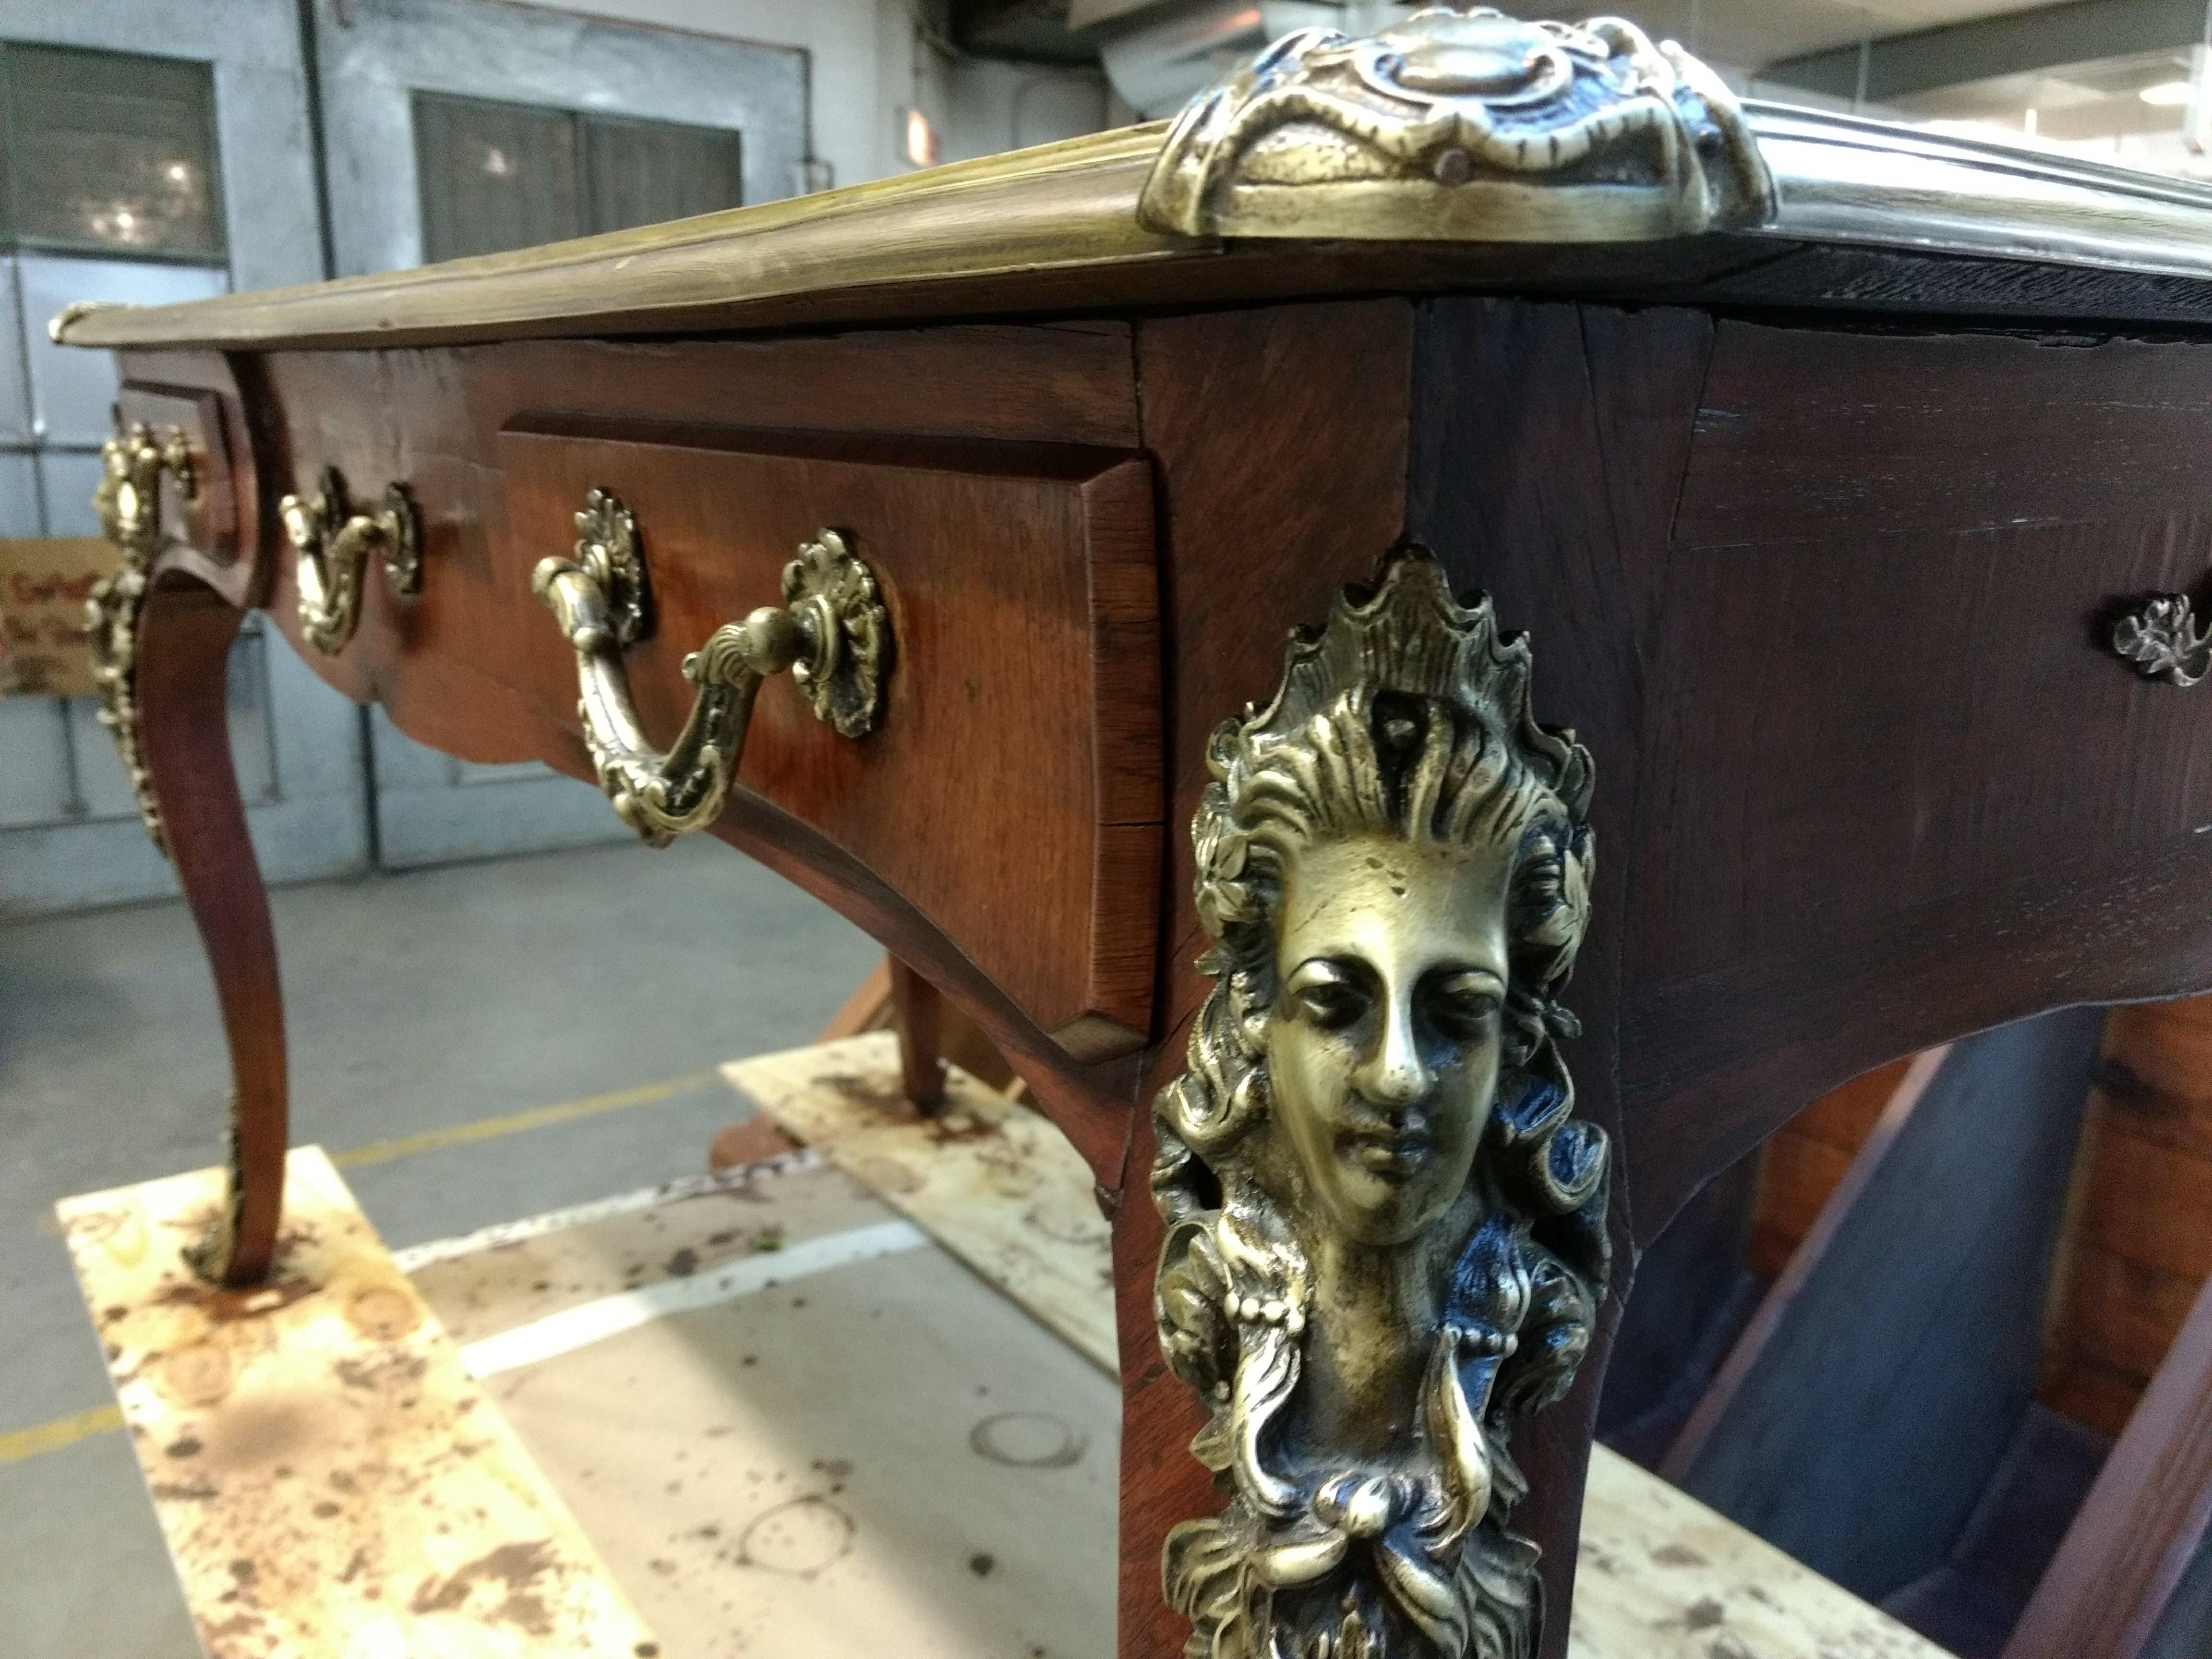 Antique Desk, Louis 15th french desk restoration, ormolu restoration, veneer repair, furniture conservation, furniture repair